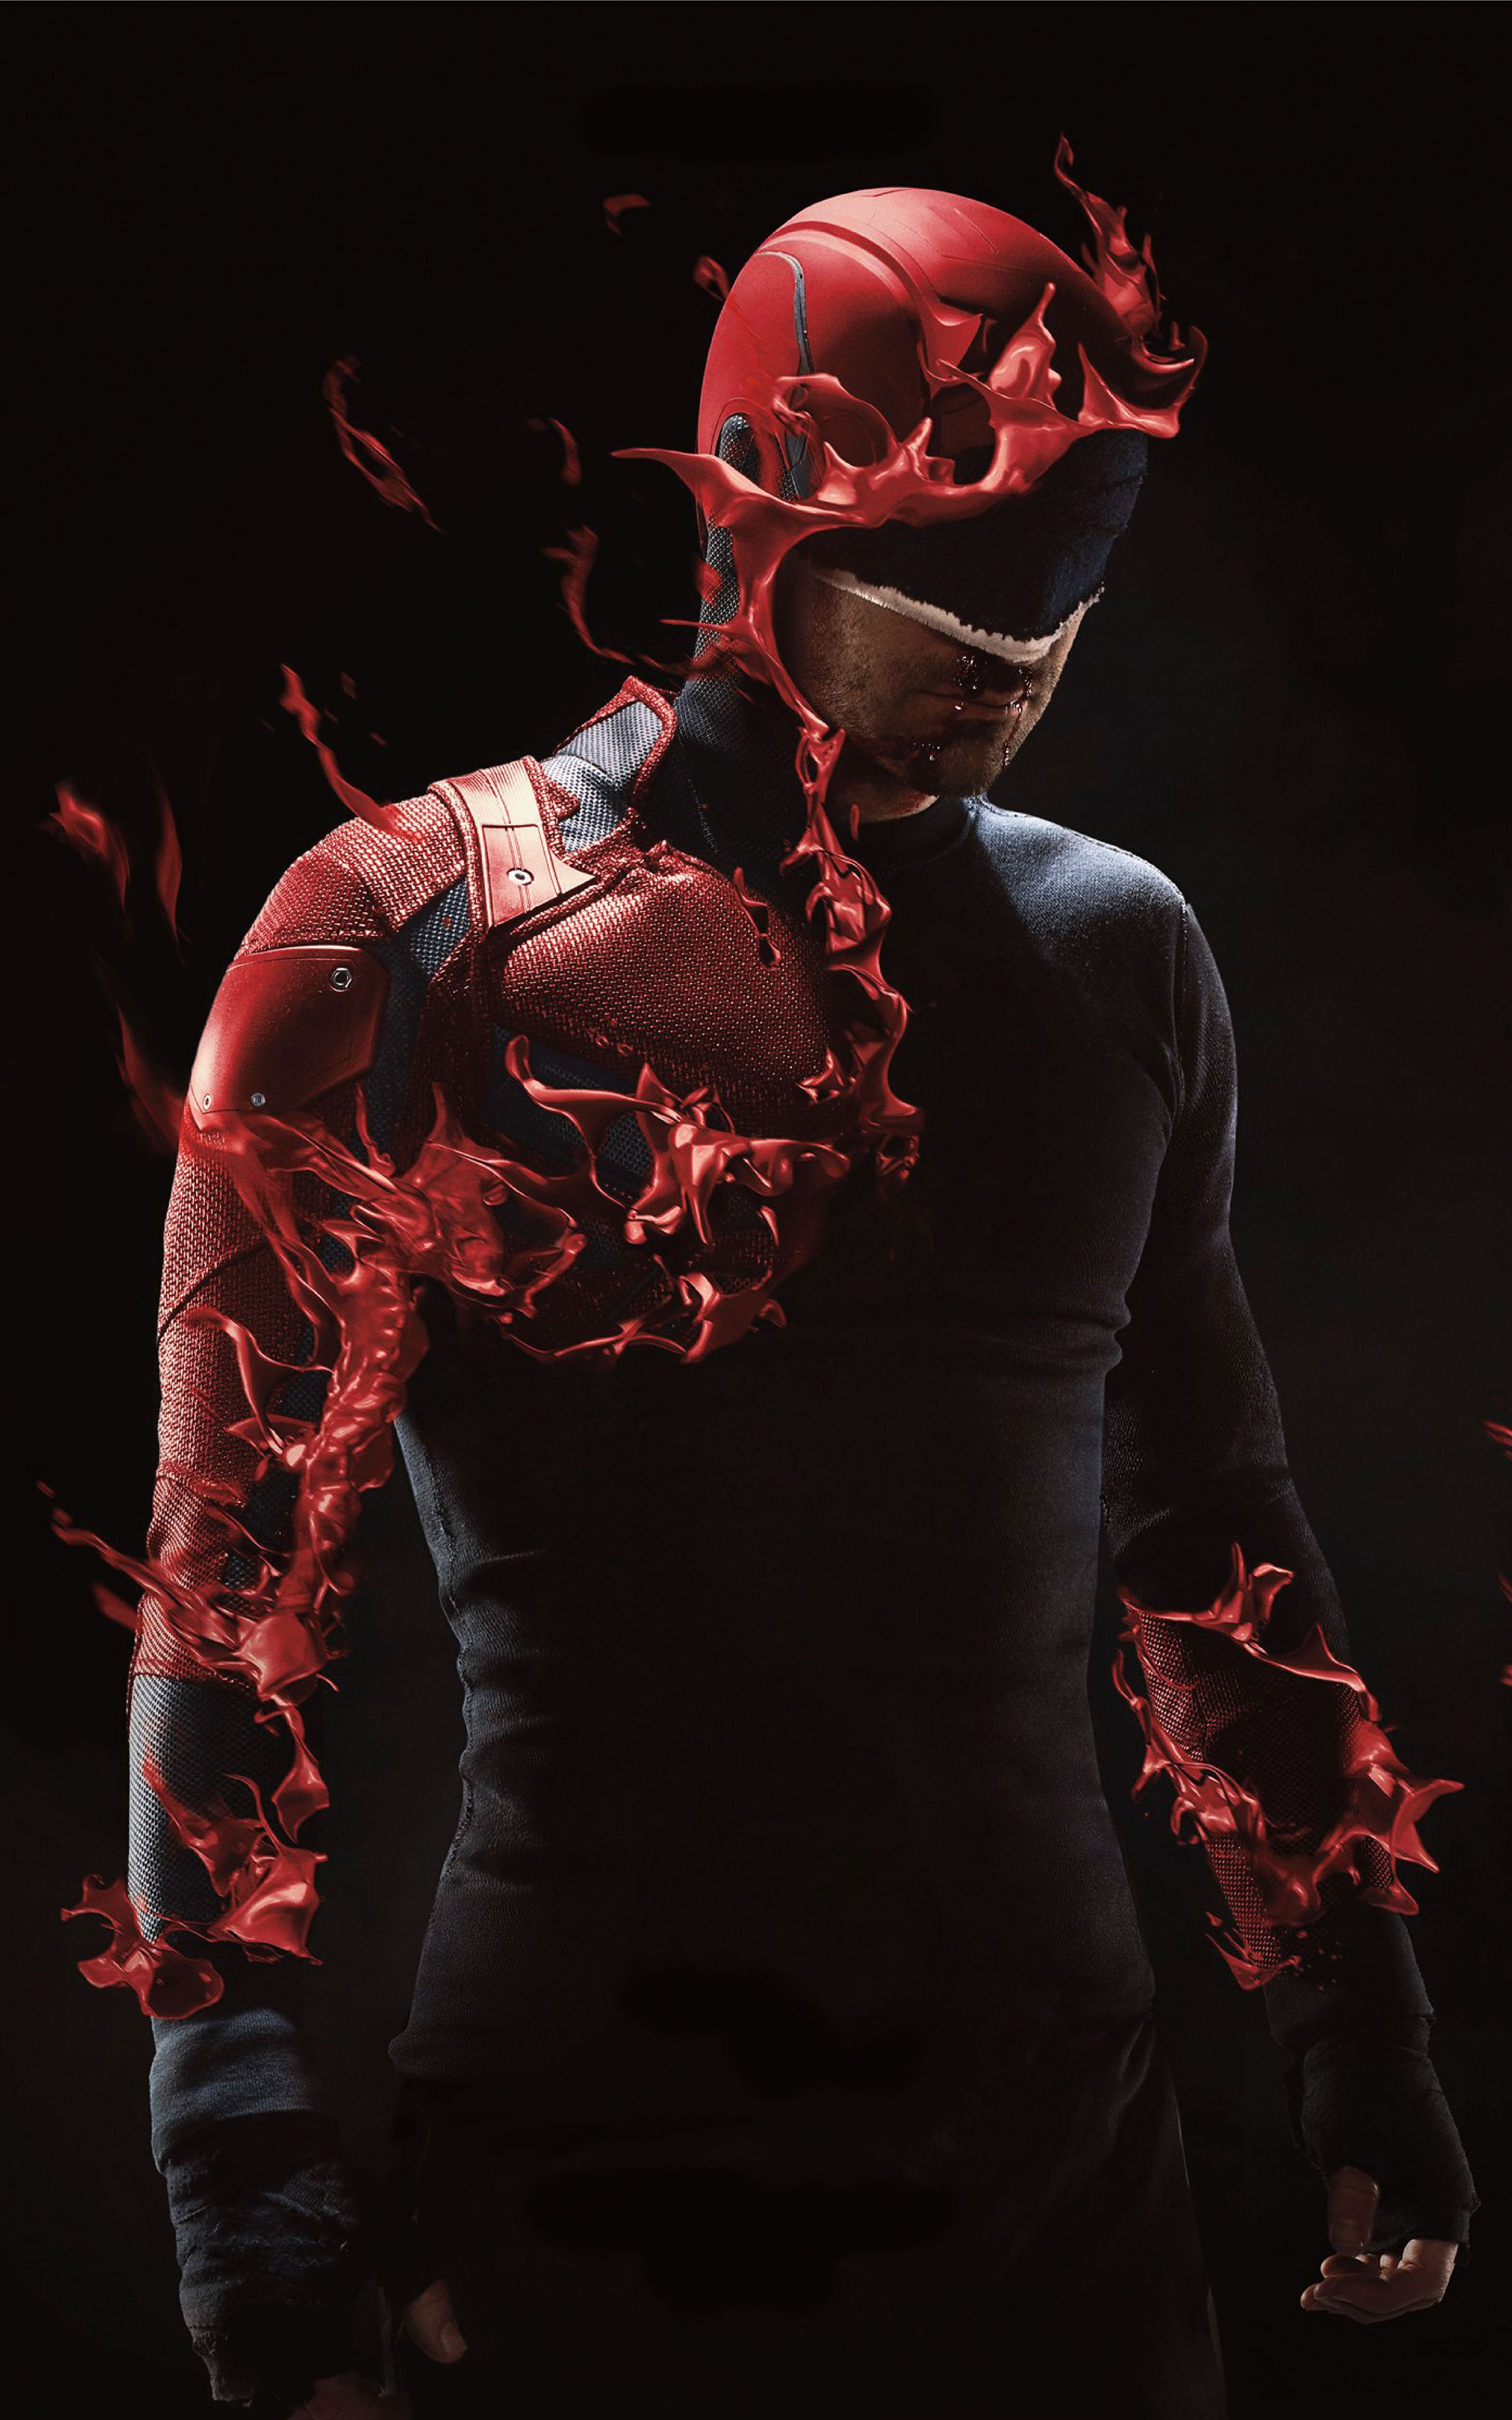 Hd Mobile Wallpaper Iphone Wallpaper 284 Marvel Daredevil Daredevil Netflix Marvel Entertainment